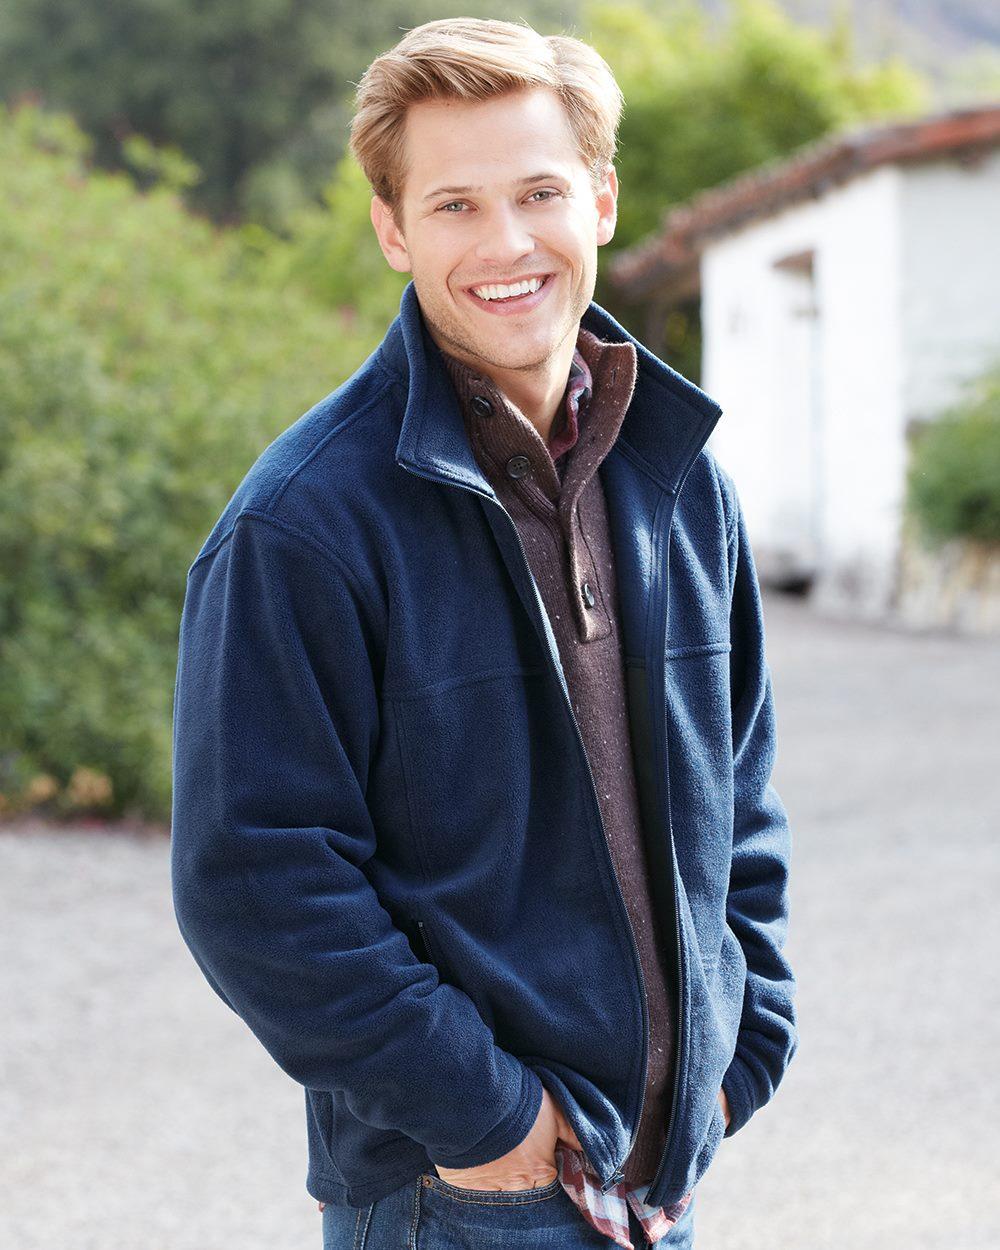 Colorado Clothing 9632 - Sport Fleece Full Zip Jacket